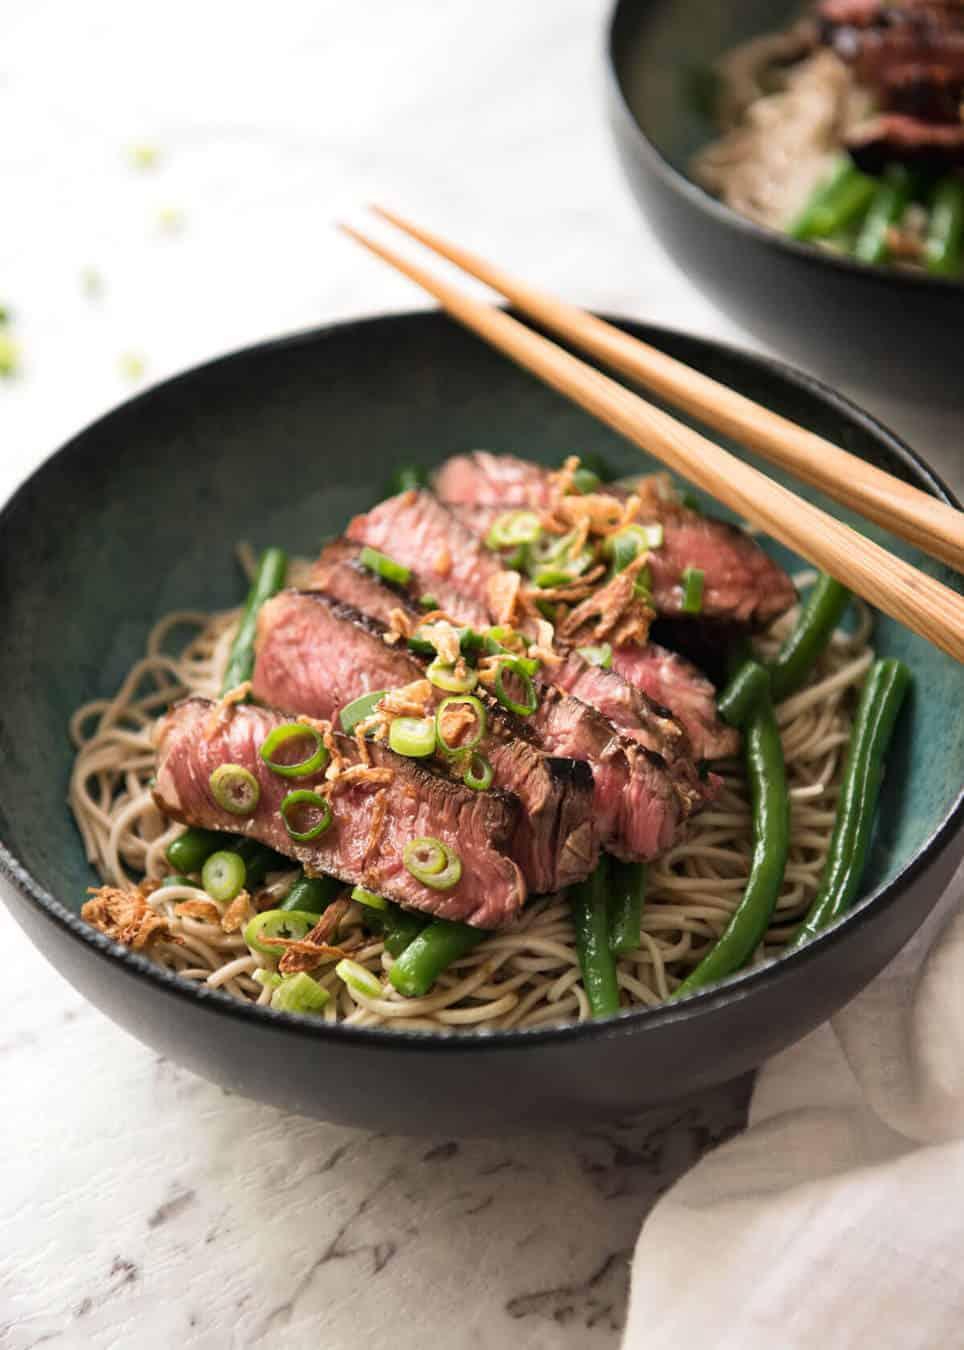 Beef Soba Noodles with chopsticks